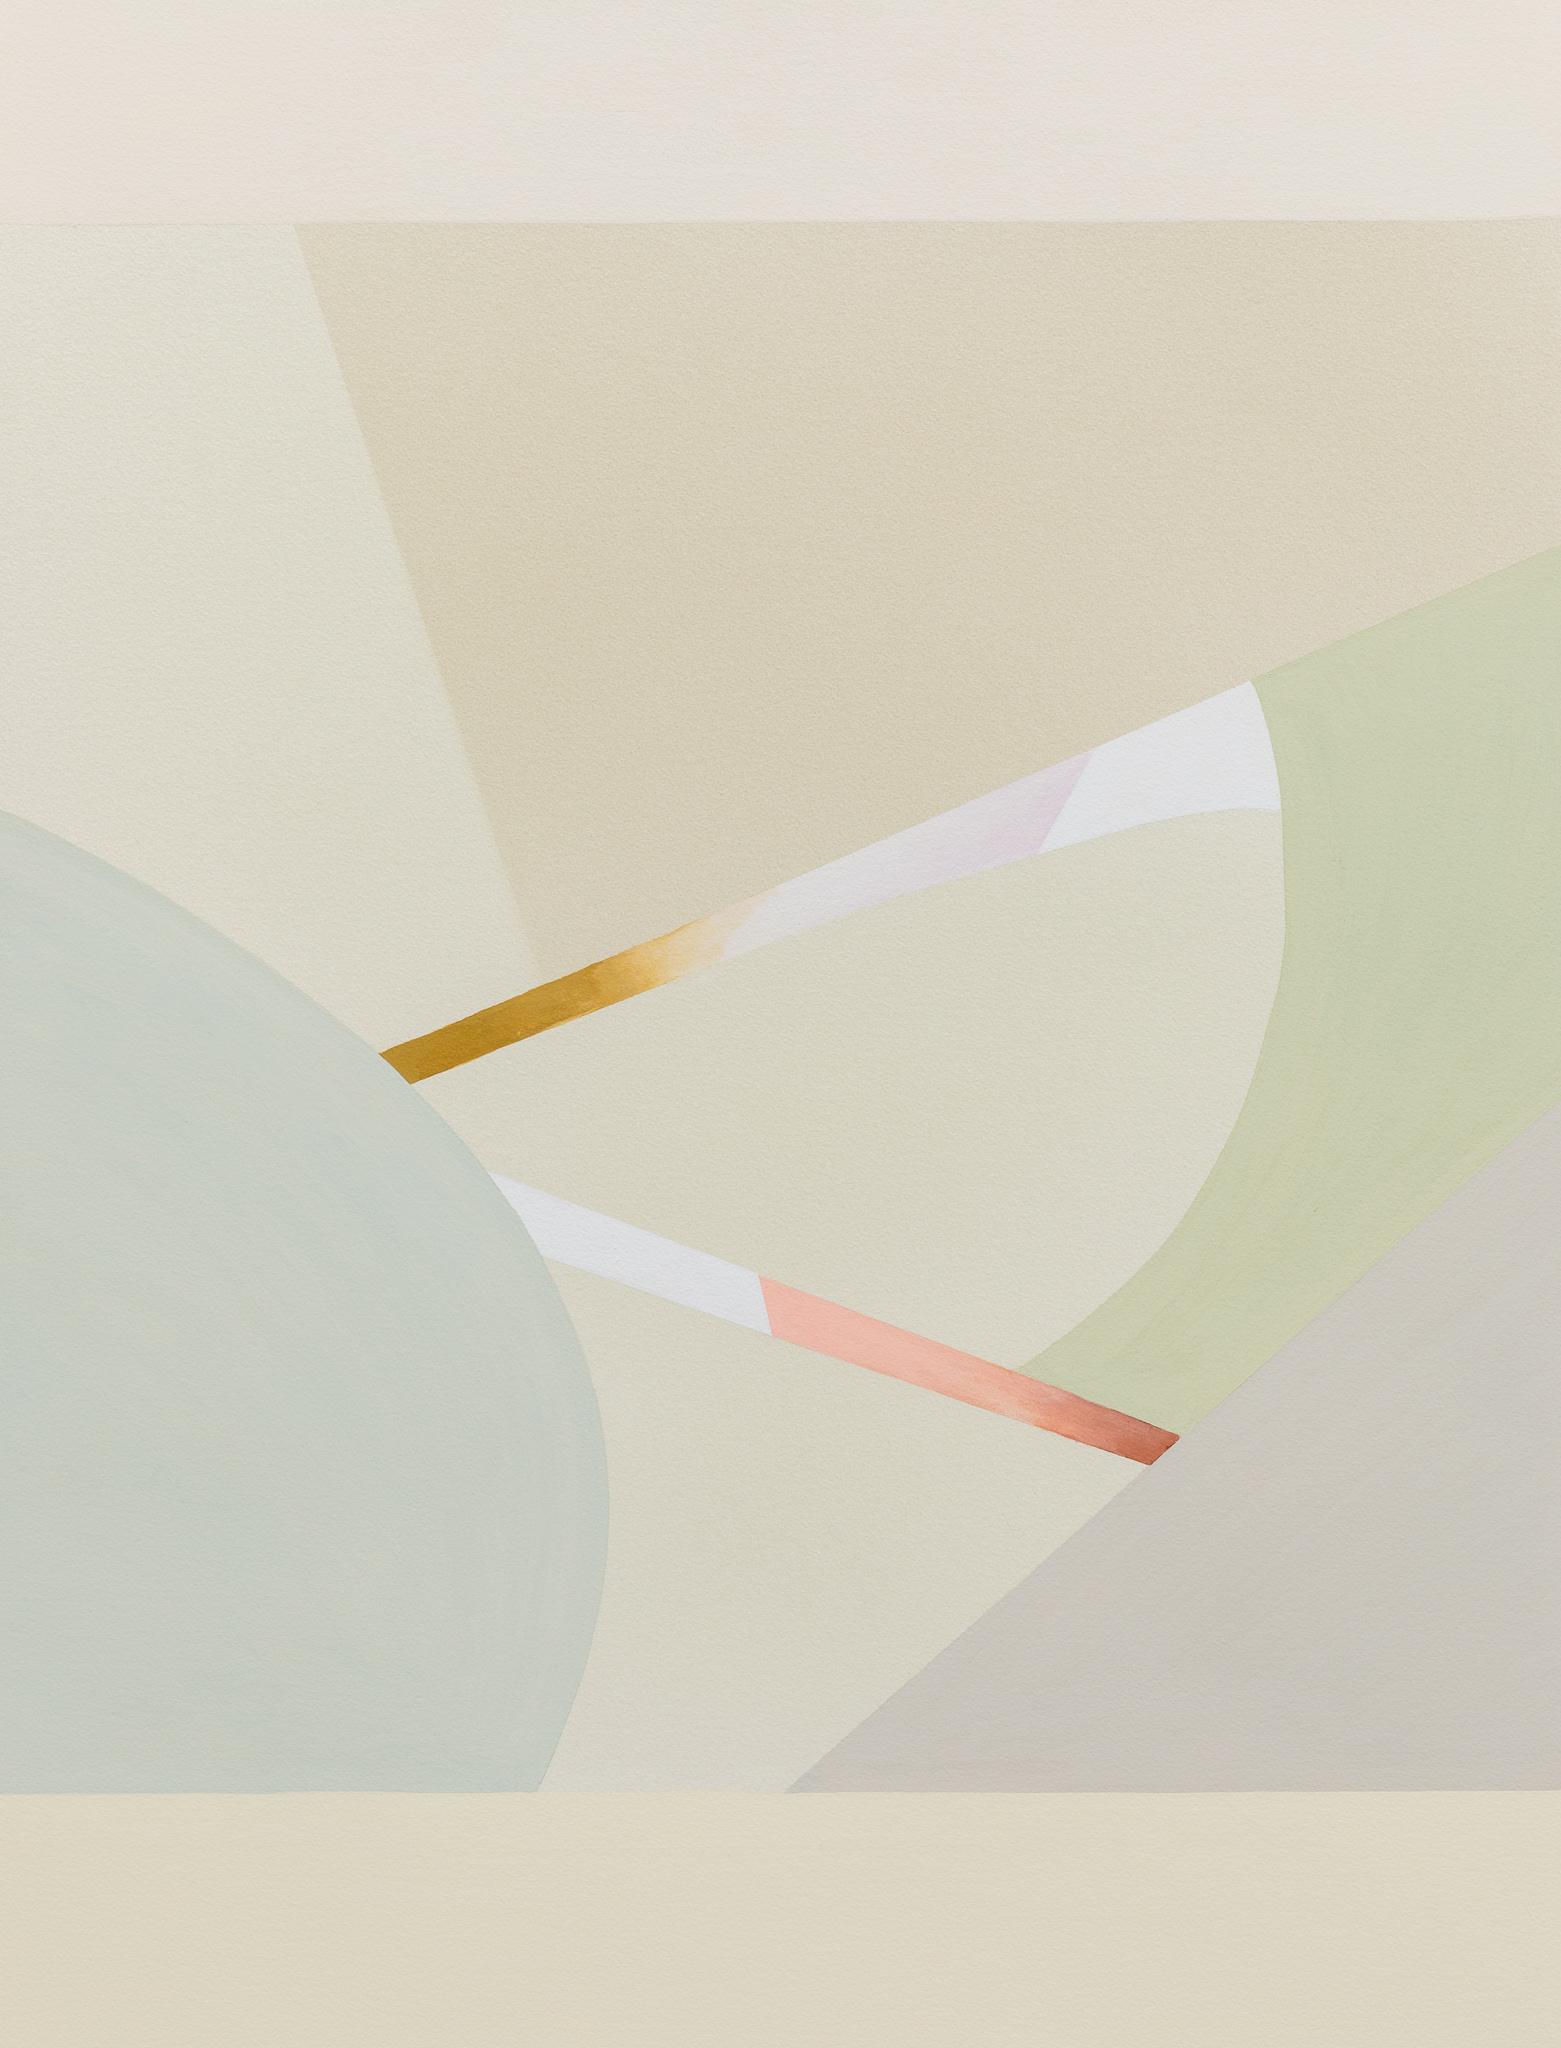 Lightcurves VIII, 2020, Watercolor and casein tempera on paper, 92 x 70 cm